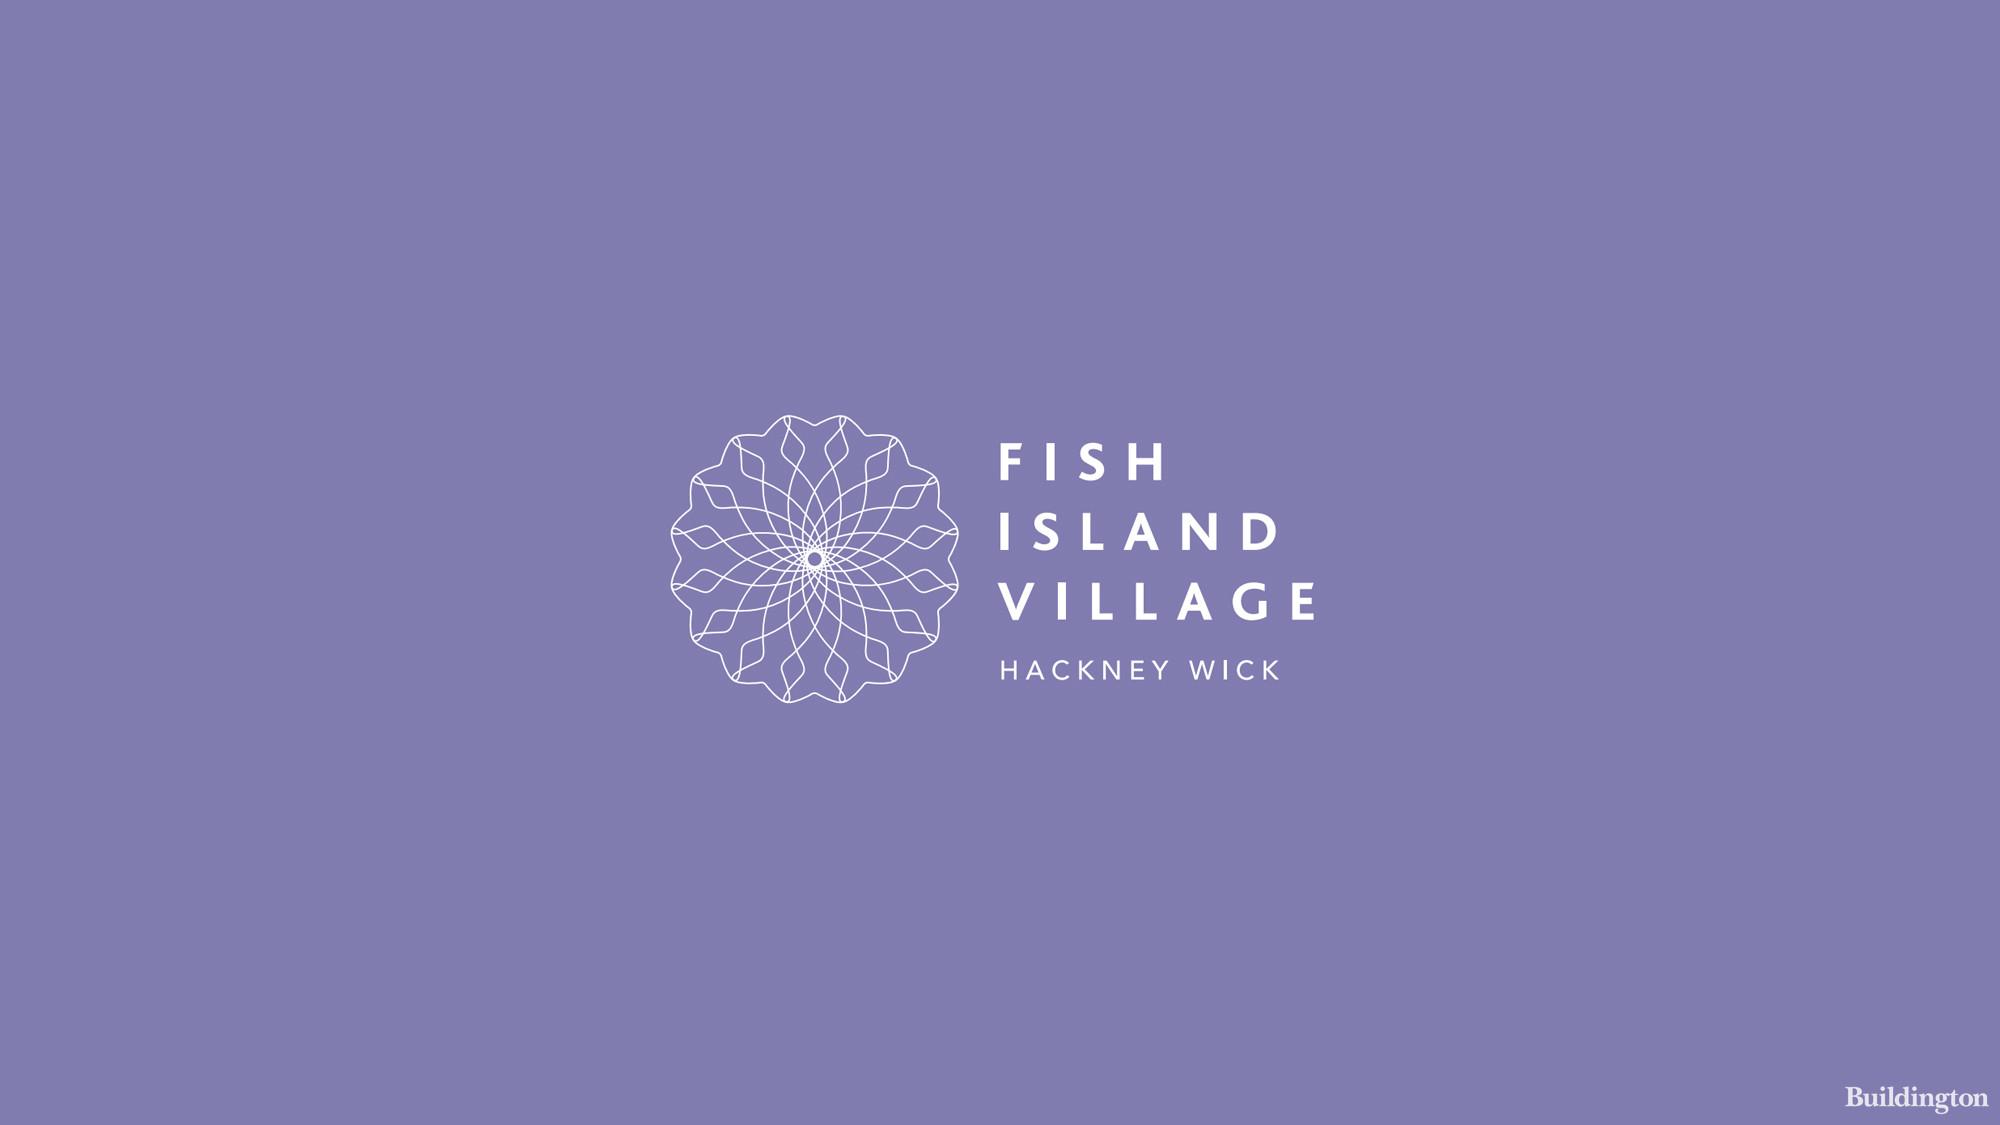 Fish Island Village development logo